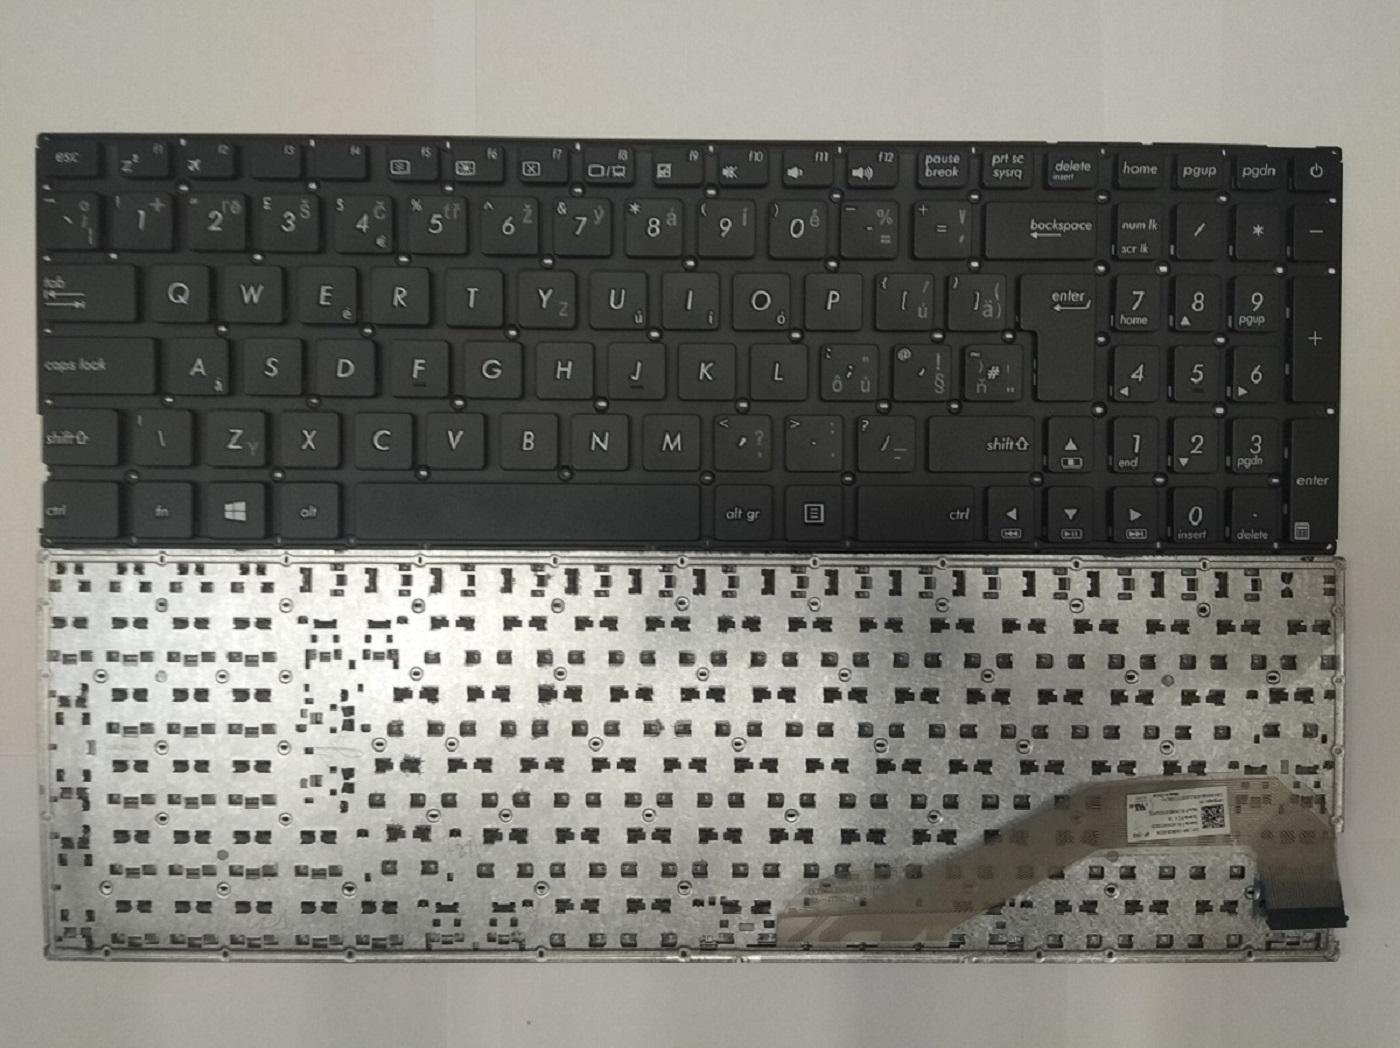 NTSUP Klávesnice Asus X540 X540L X540LA X540LJ X540S X540SA X540SC černá CZ/SK - 28890026